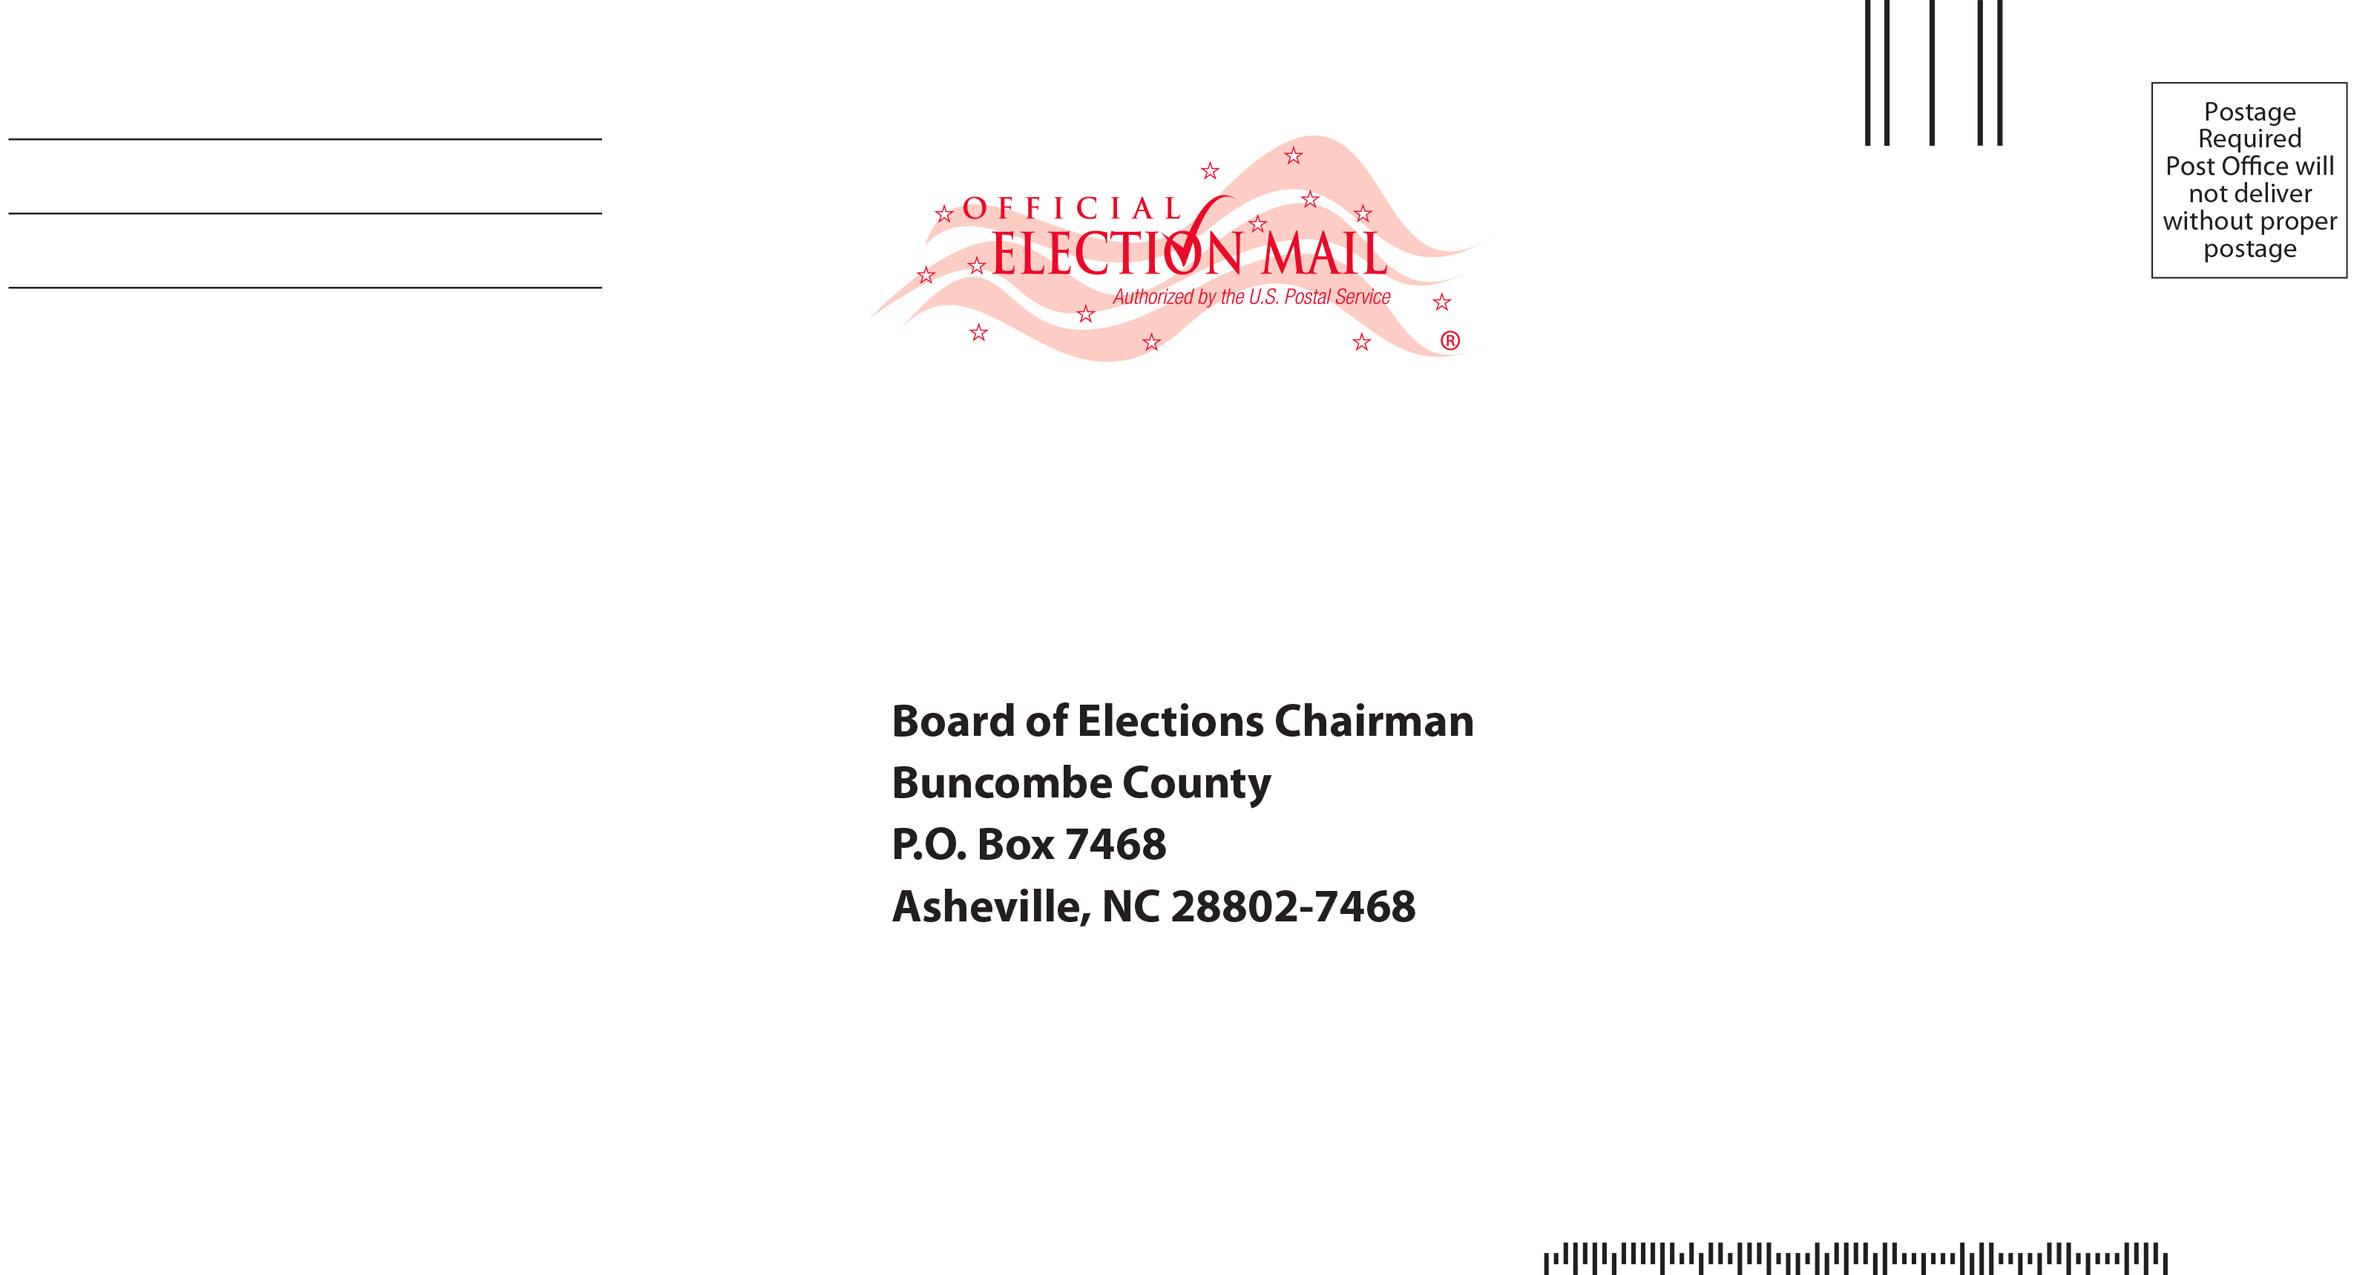 North Carolina mail-in envelope